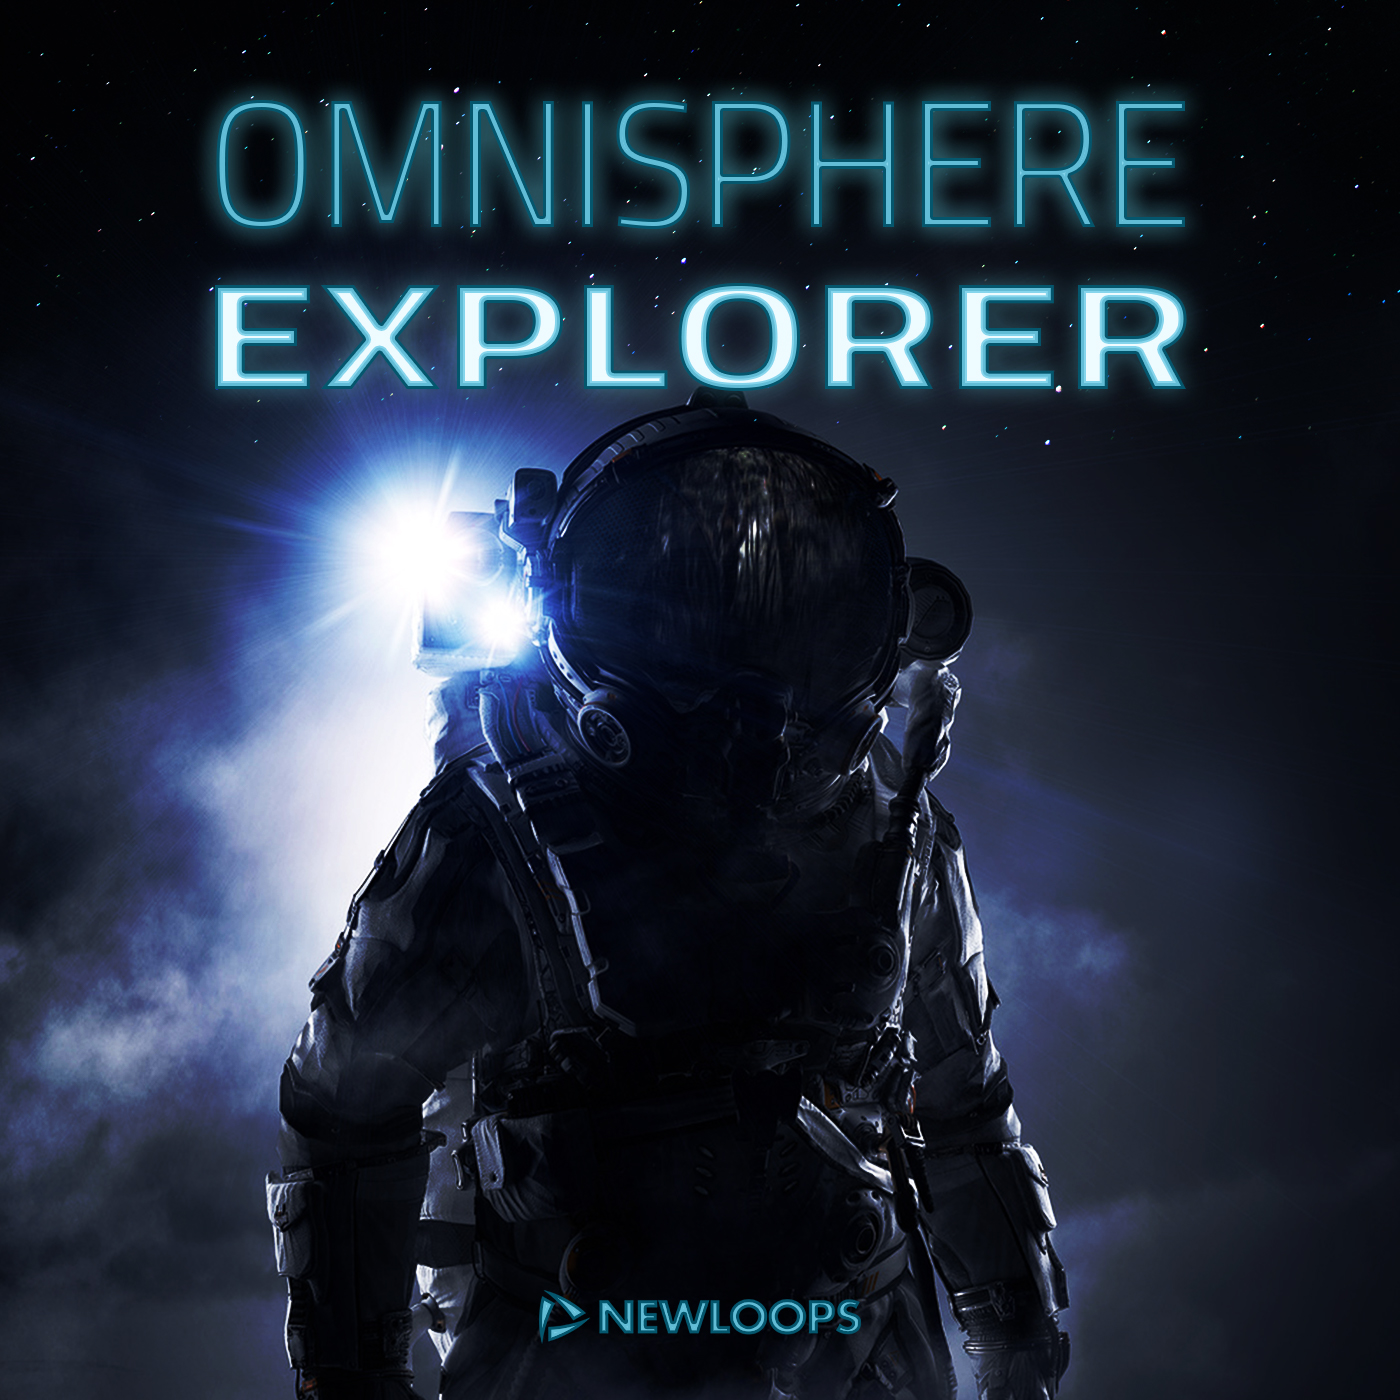 Omnisphere Explorer (Omnipshere 2 Presets) | Synthmob